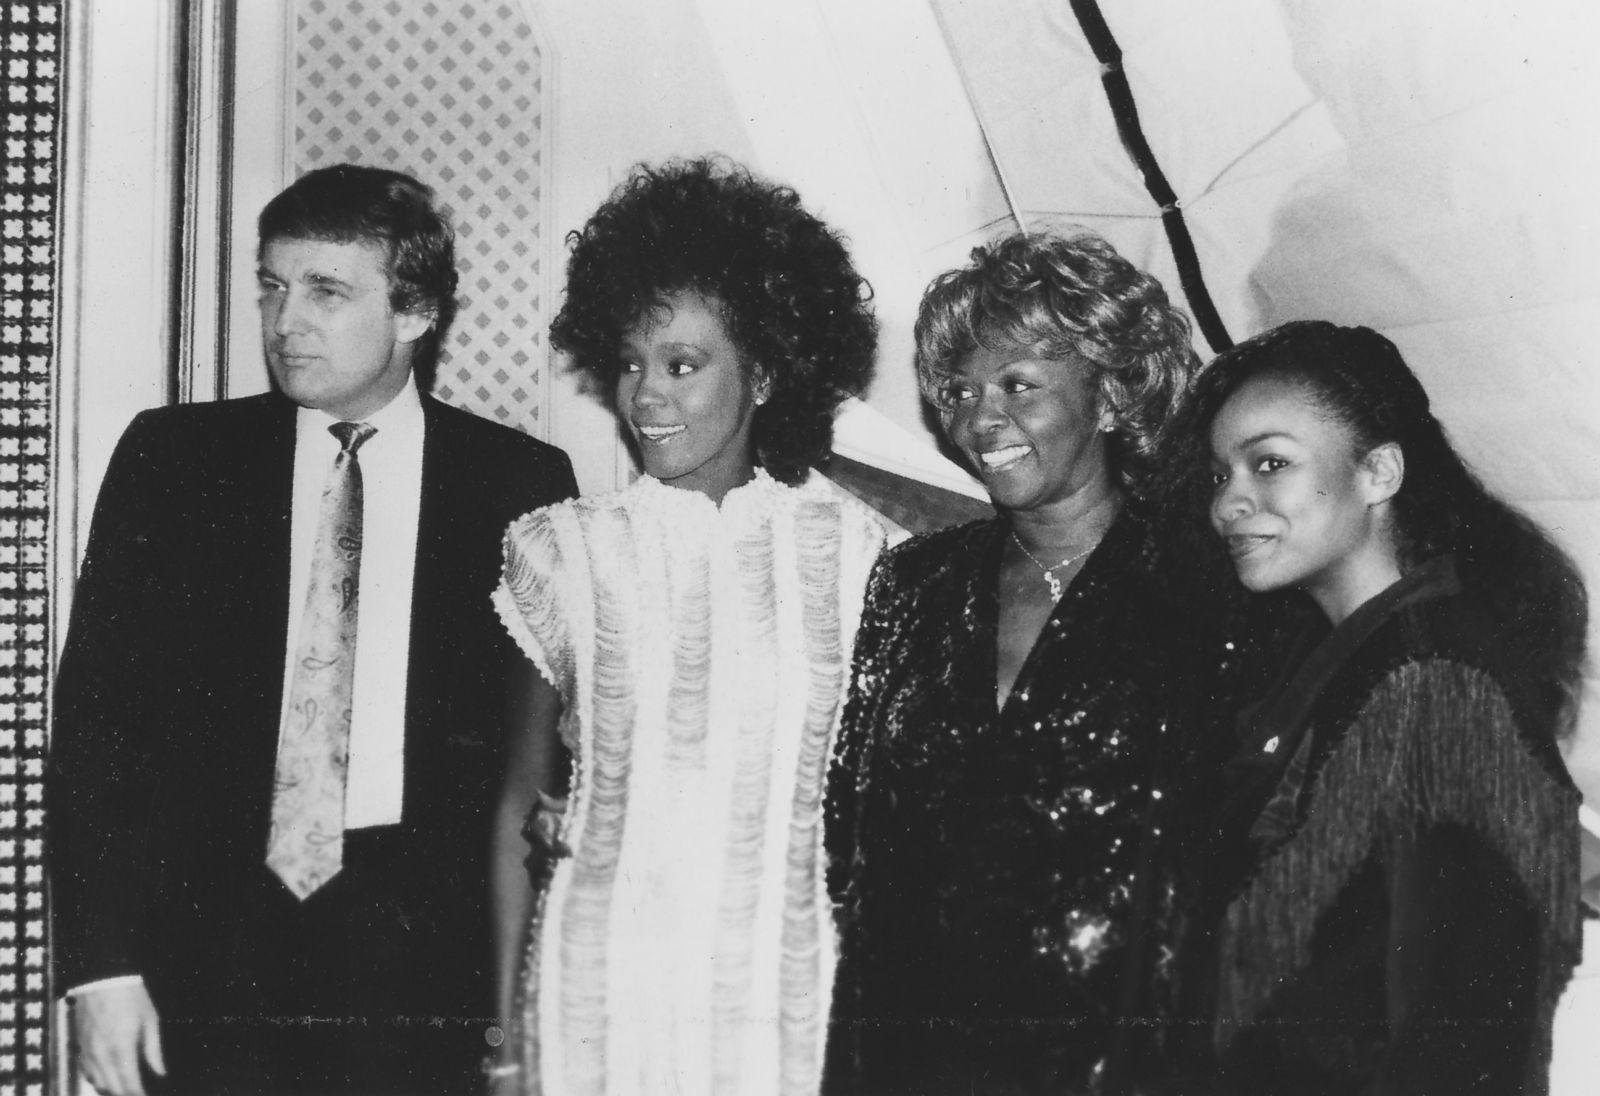 GTY_Donald_Trump_Whitney_Houston_ER_1603